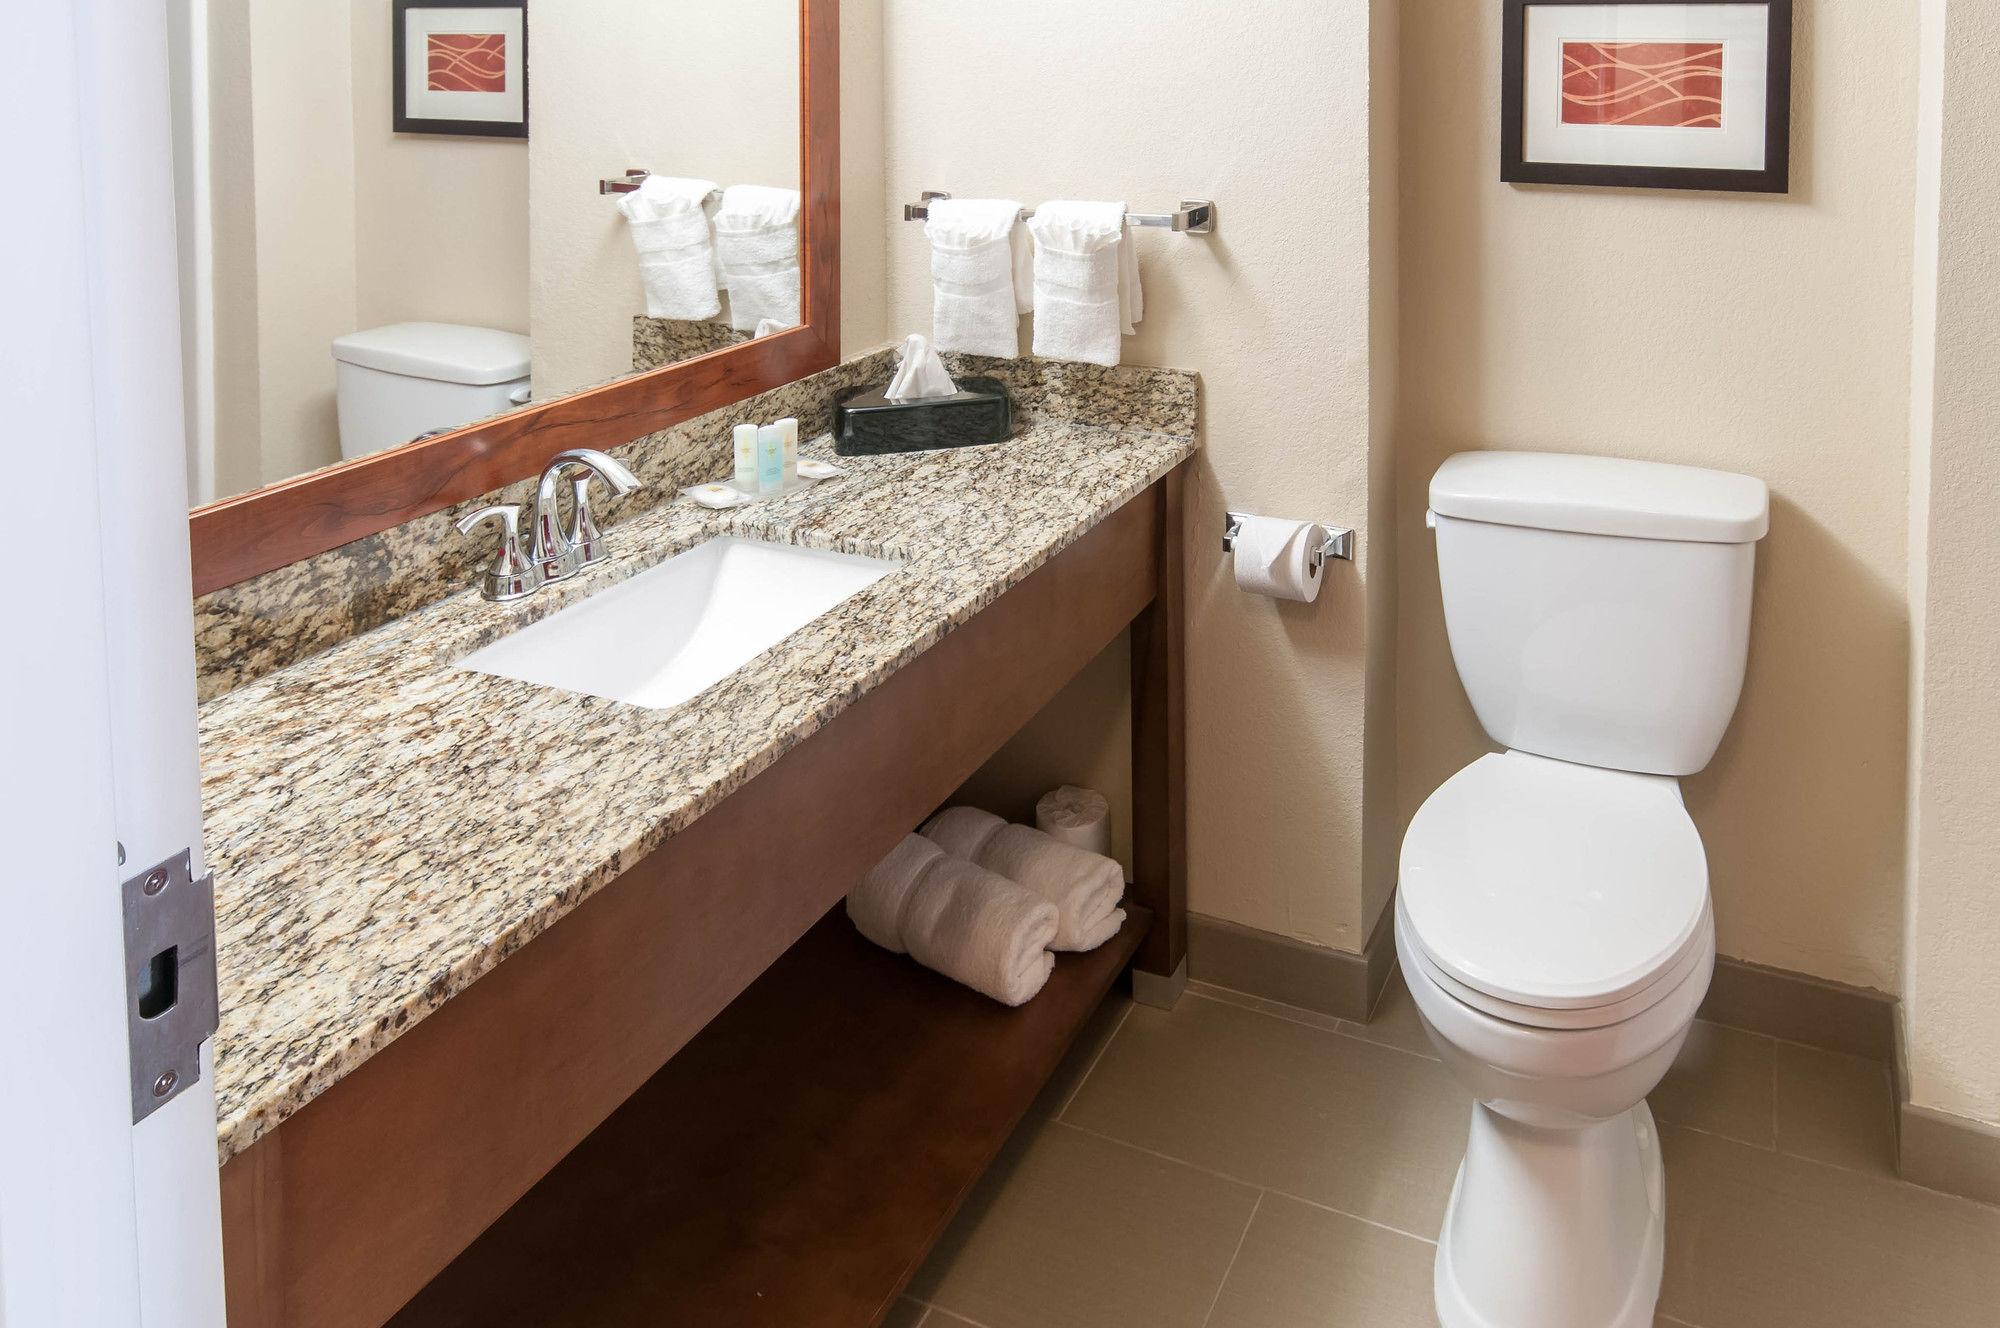 Comfort Inn & Suites La Grange in LaGrange, GA